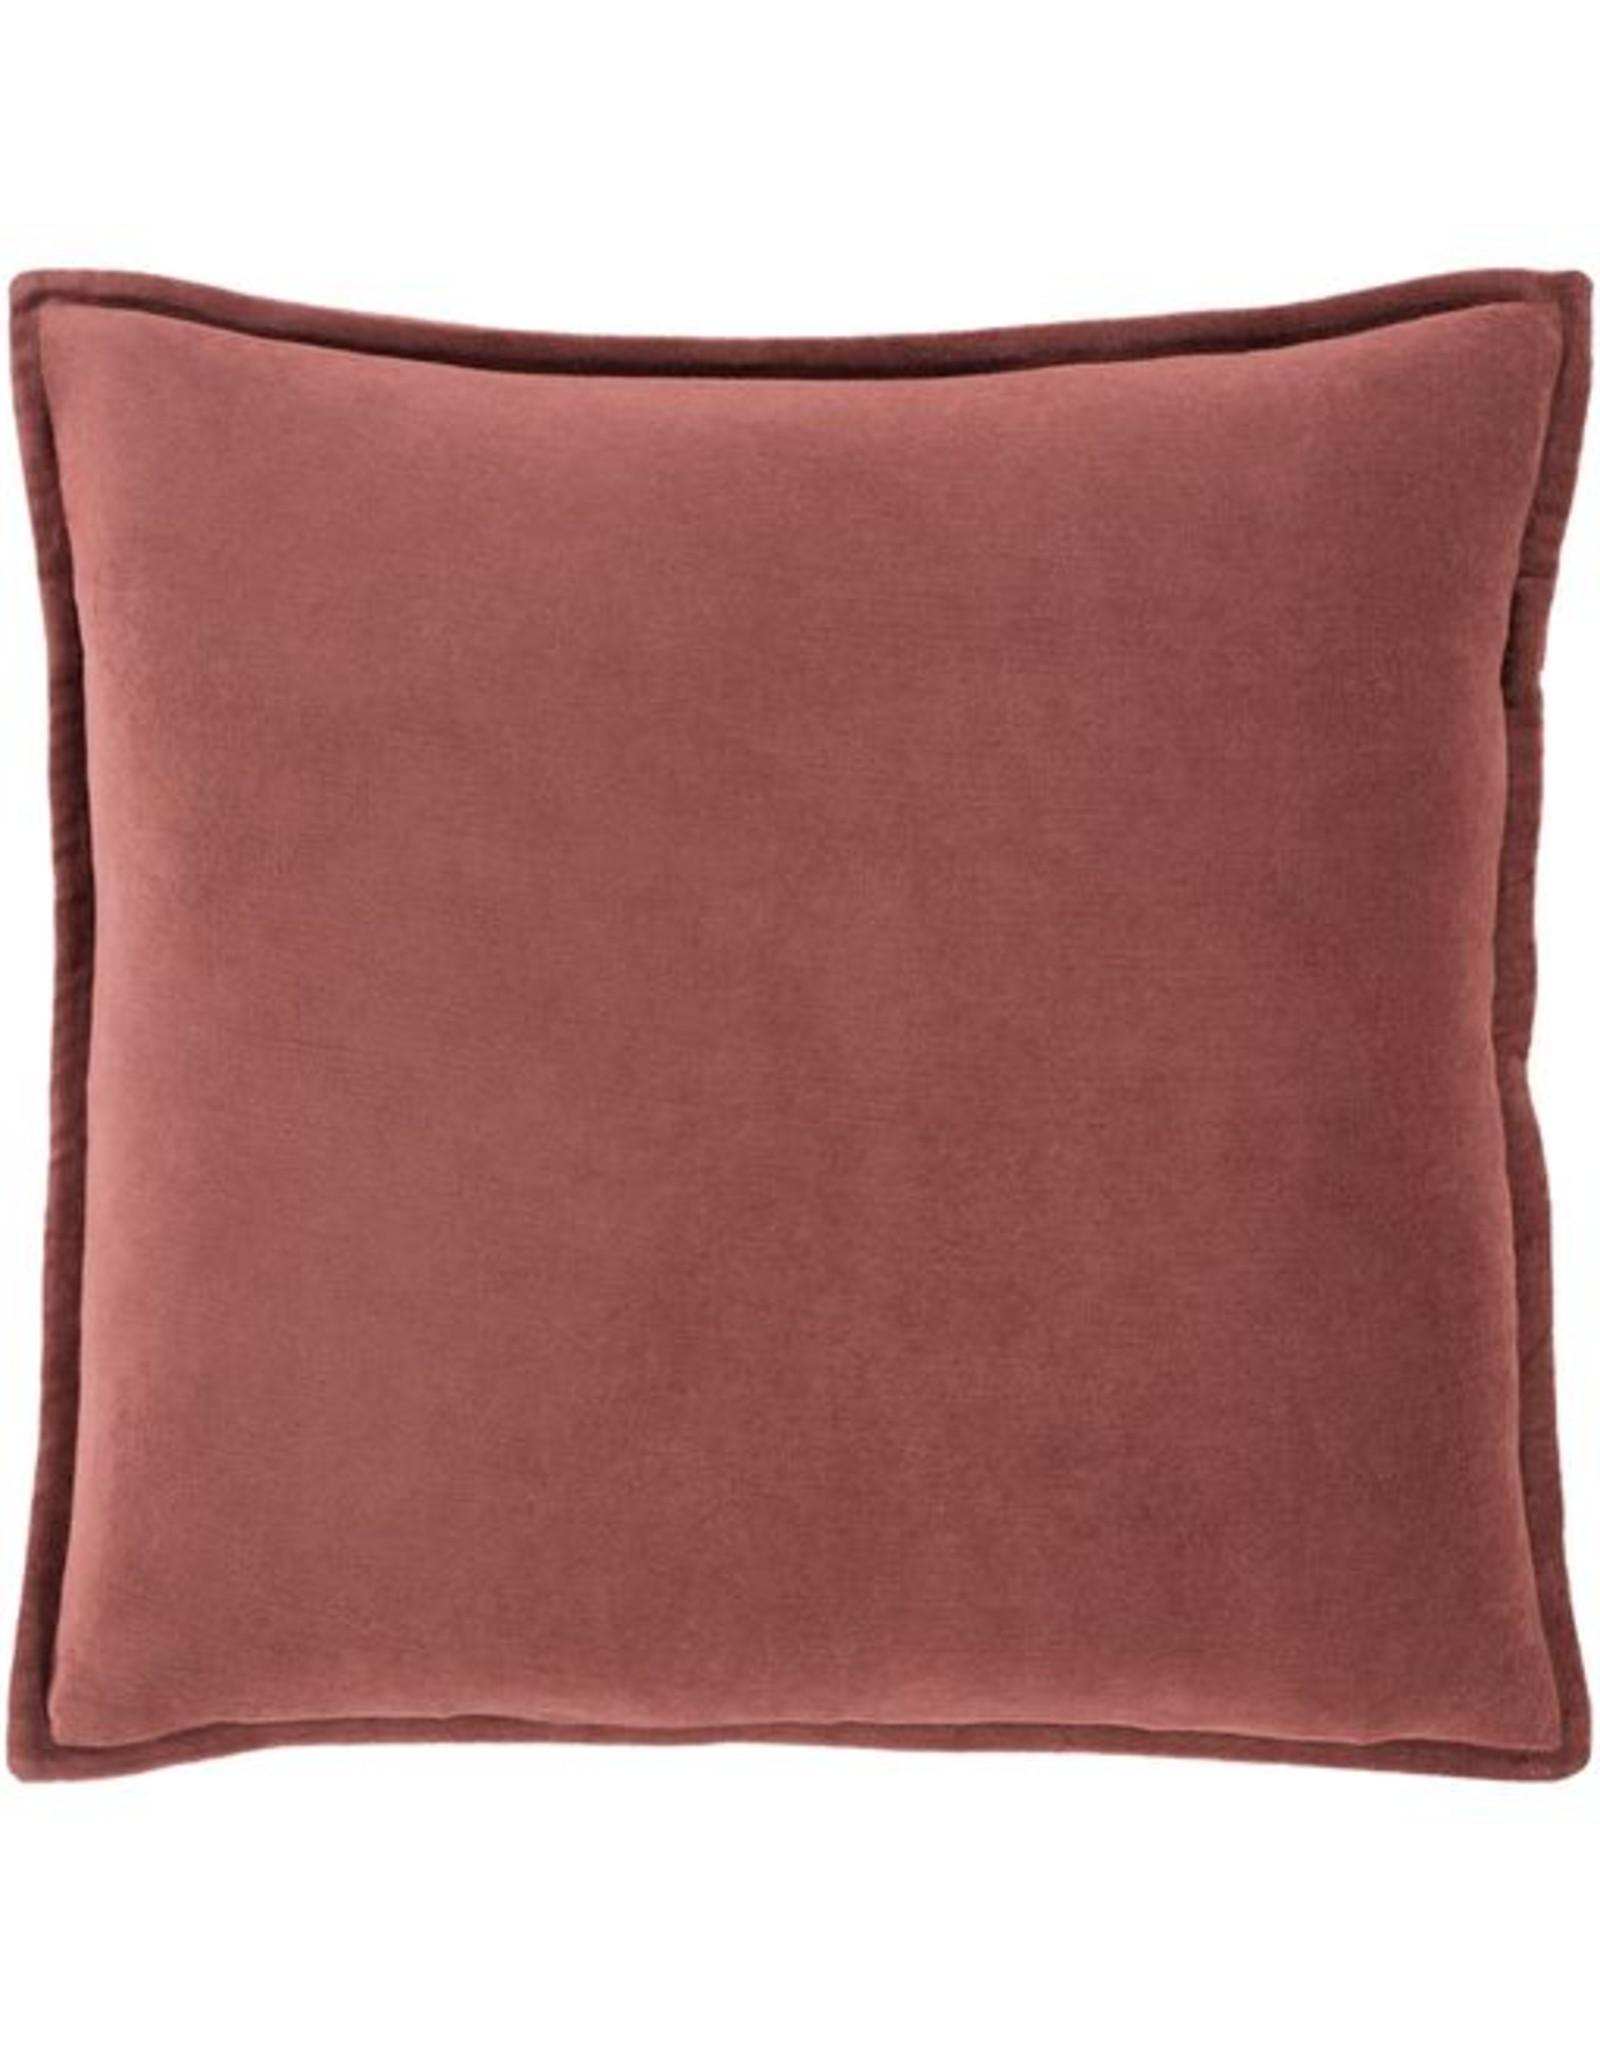 Surya Surya Velvet Dark Green 18x18 Pillows